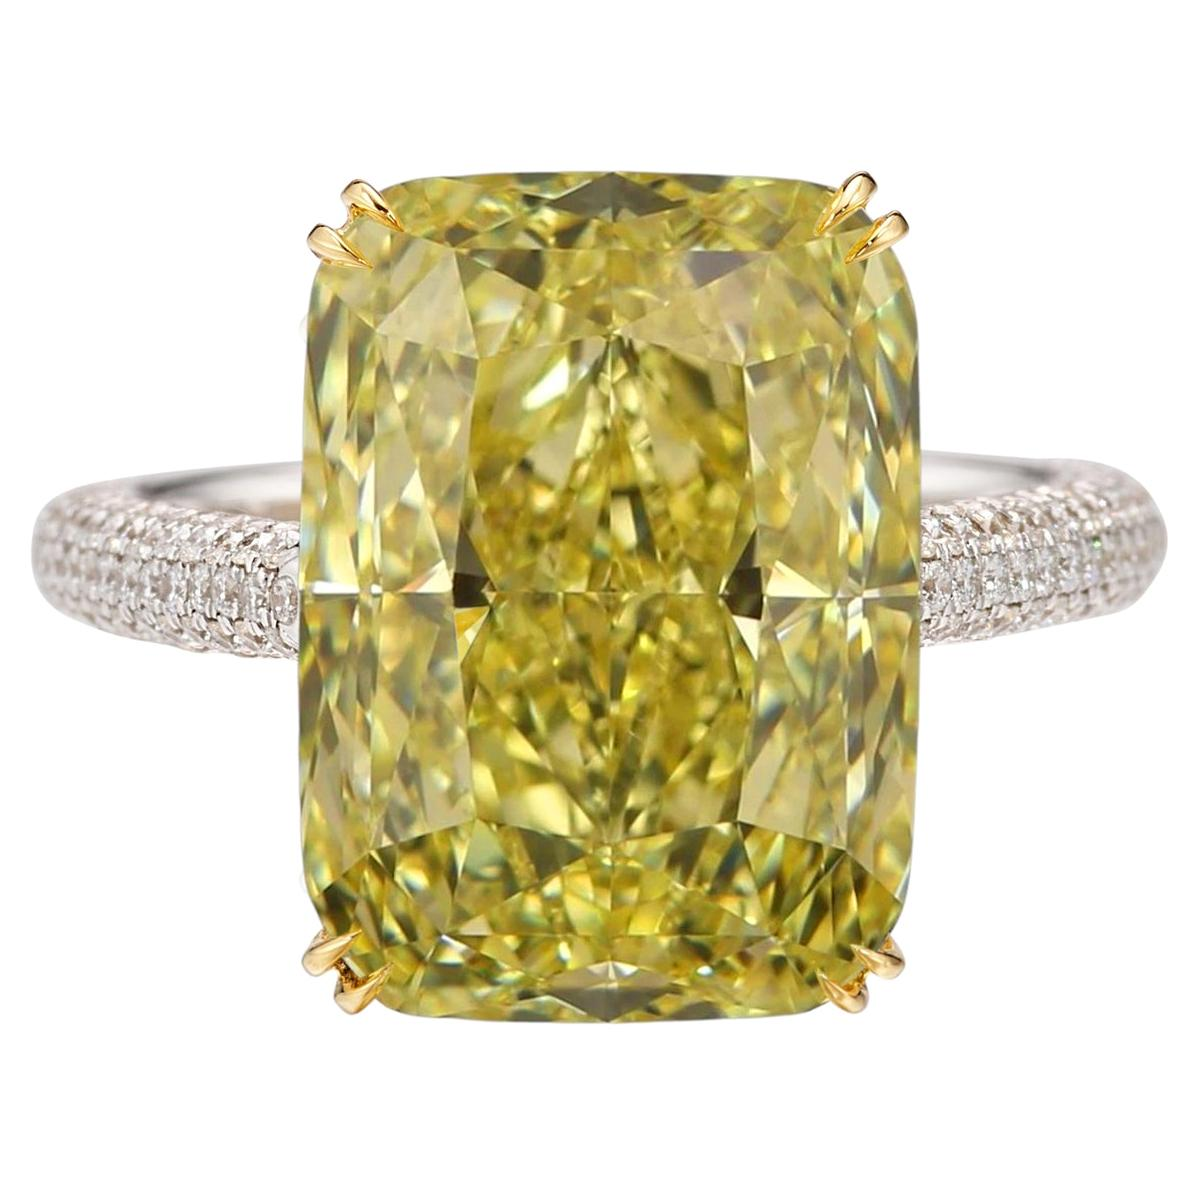 Flawless GIA Certified 8 Carat Fancy Intense Yellow Diamond Ring